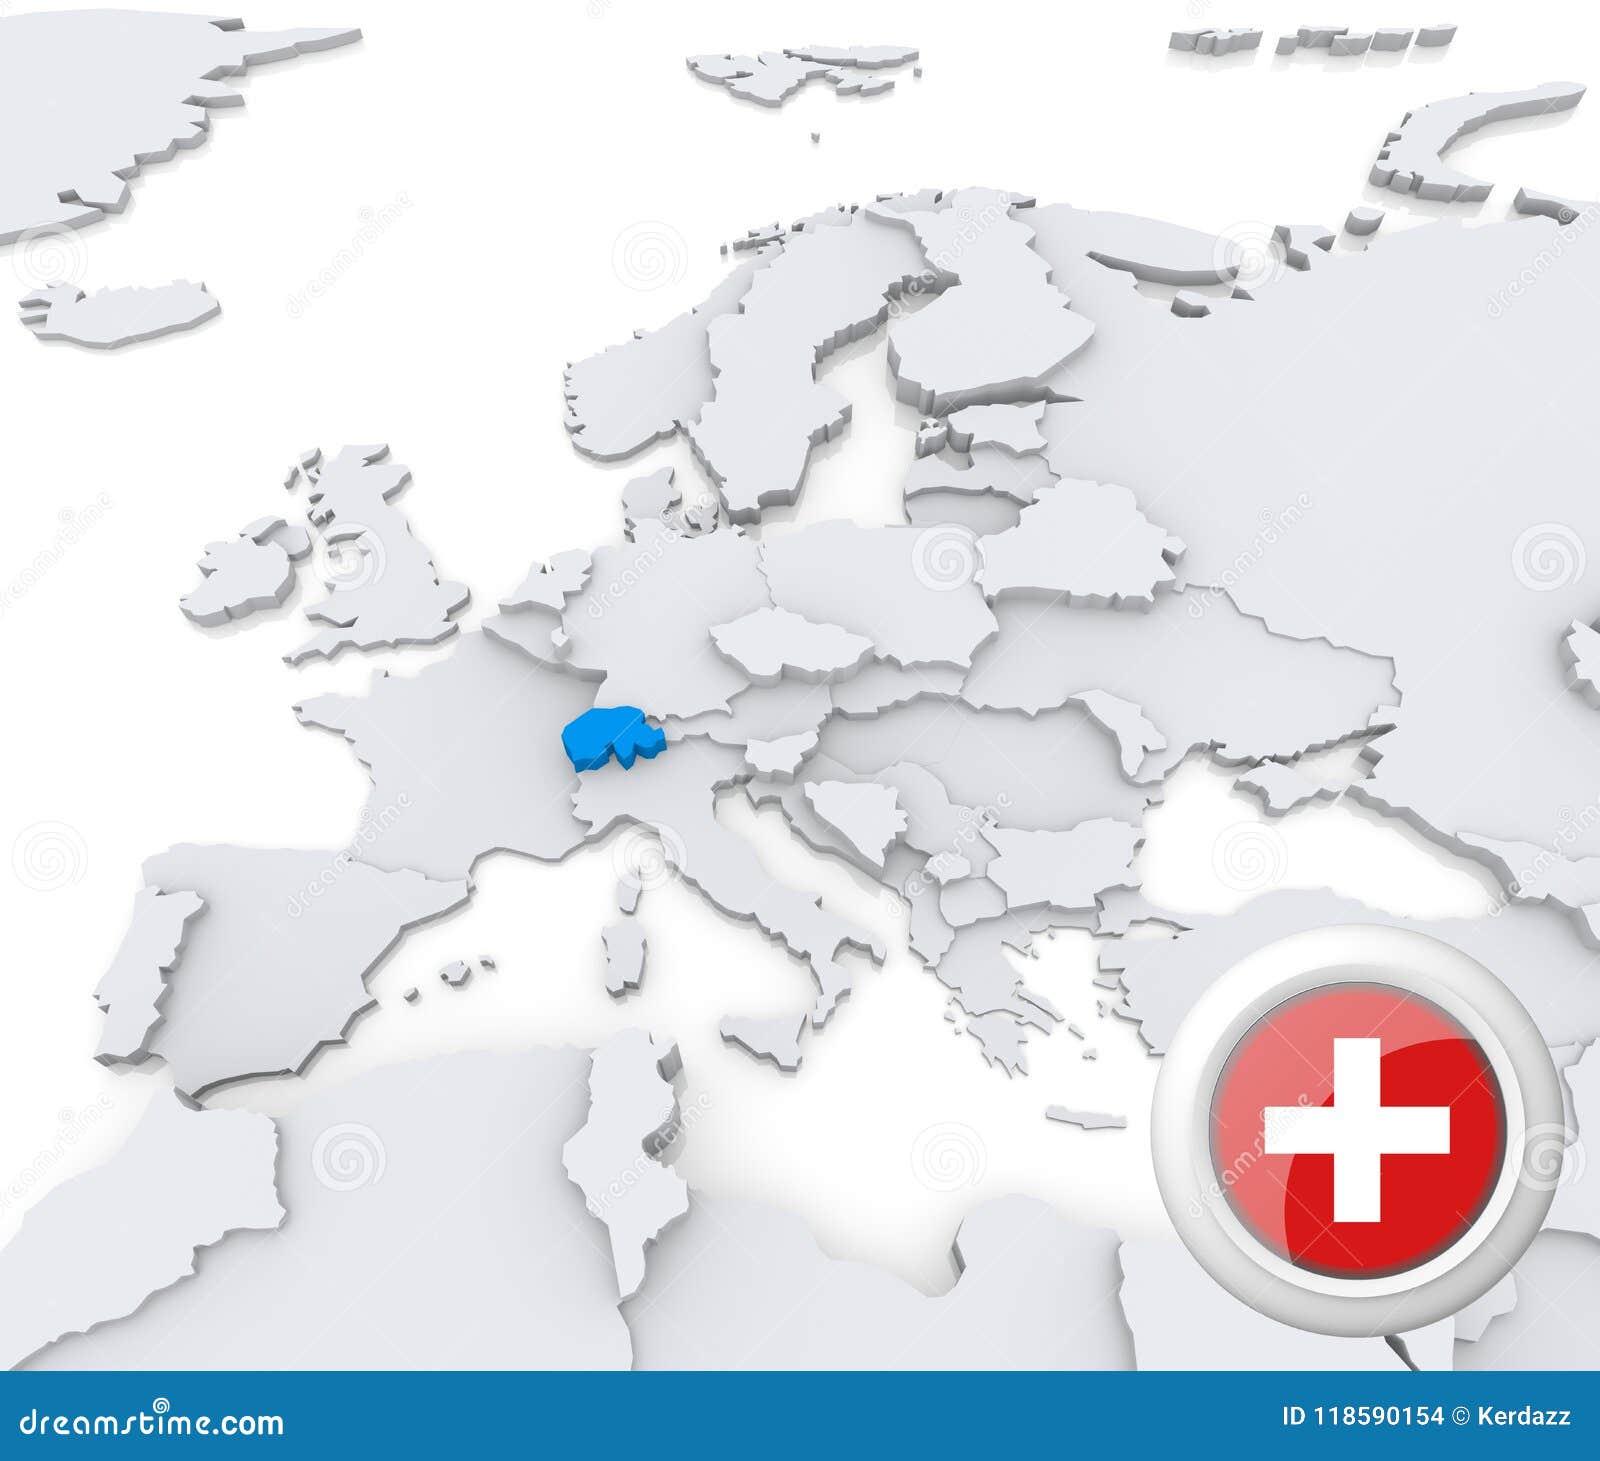 Switzerland On Map Of Europe Stock Illustration Illustration Of